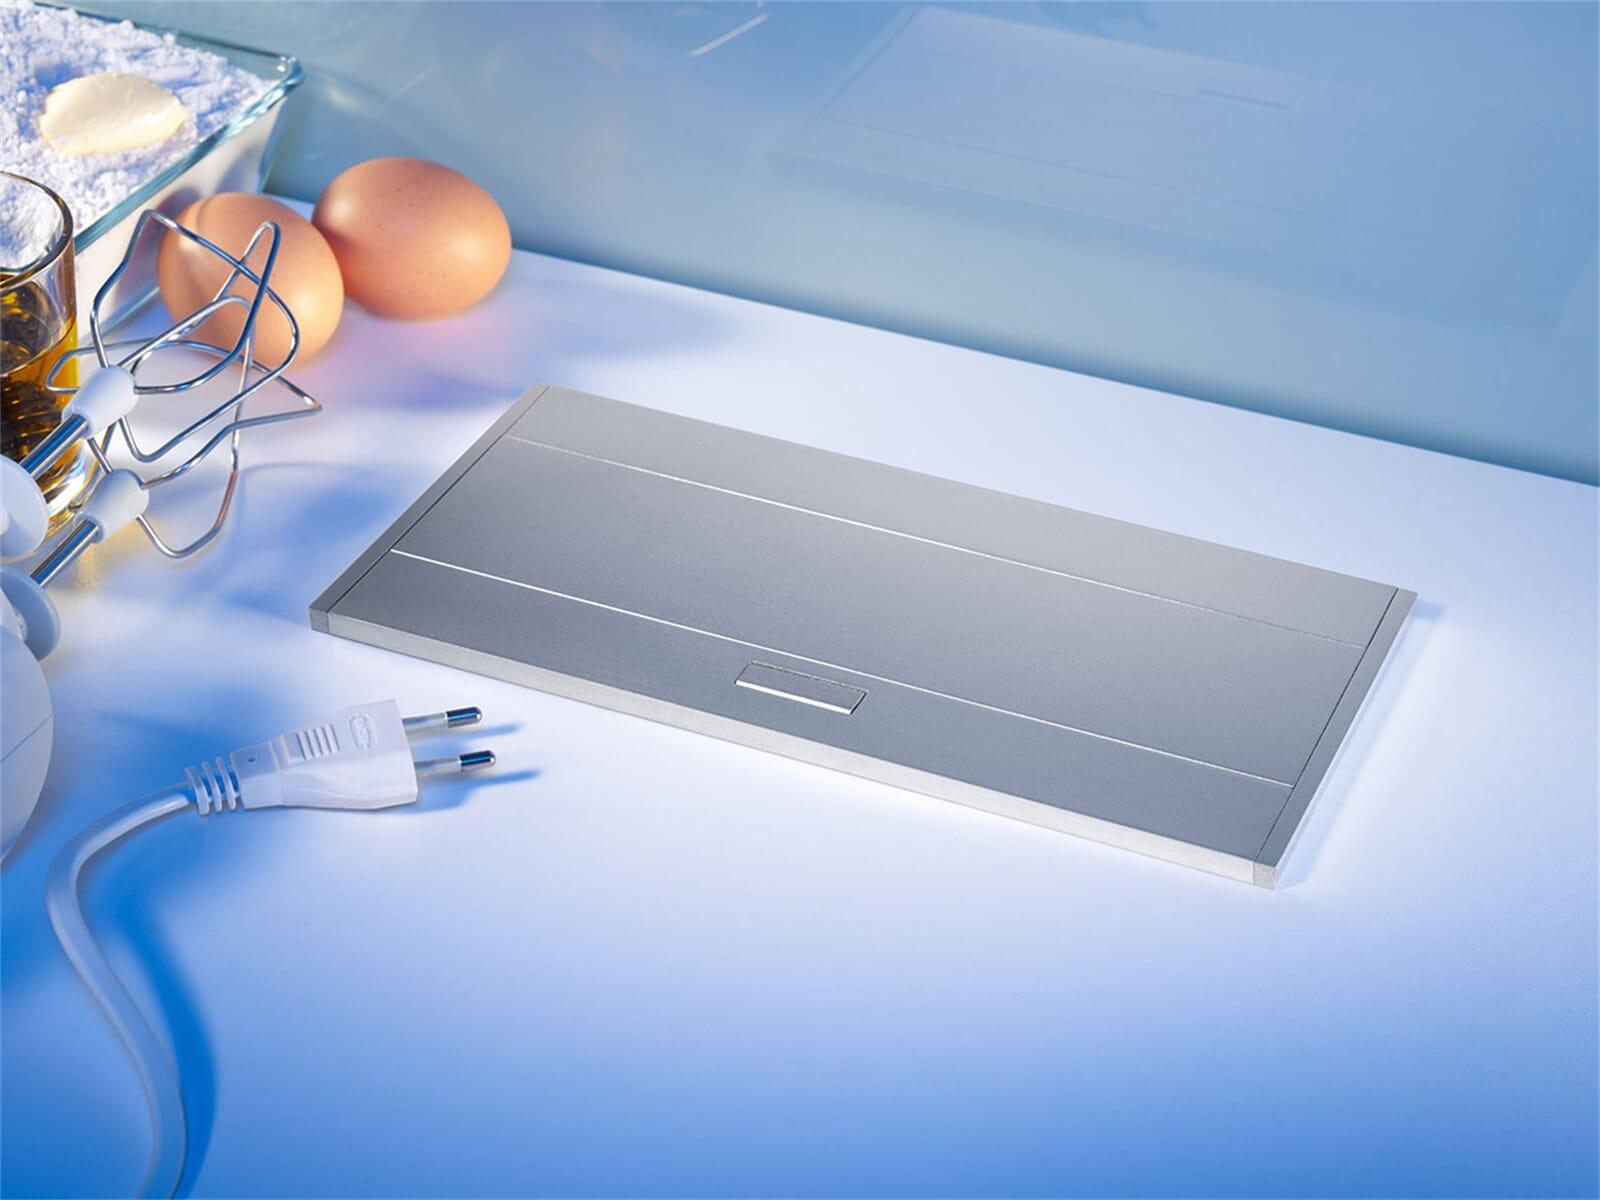 Thebo APS 11 USB - 17116 Tischsteckdose Aluminium